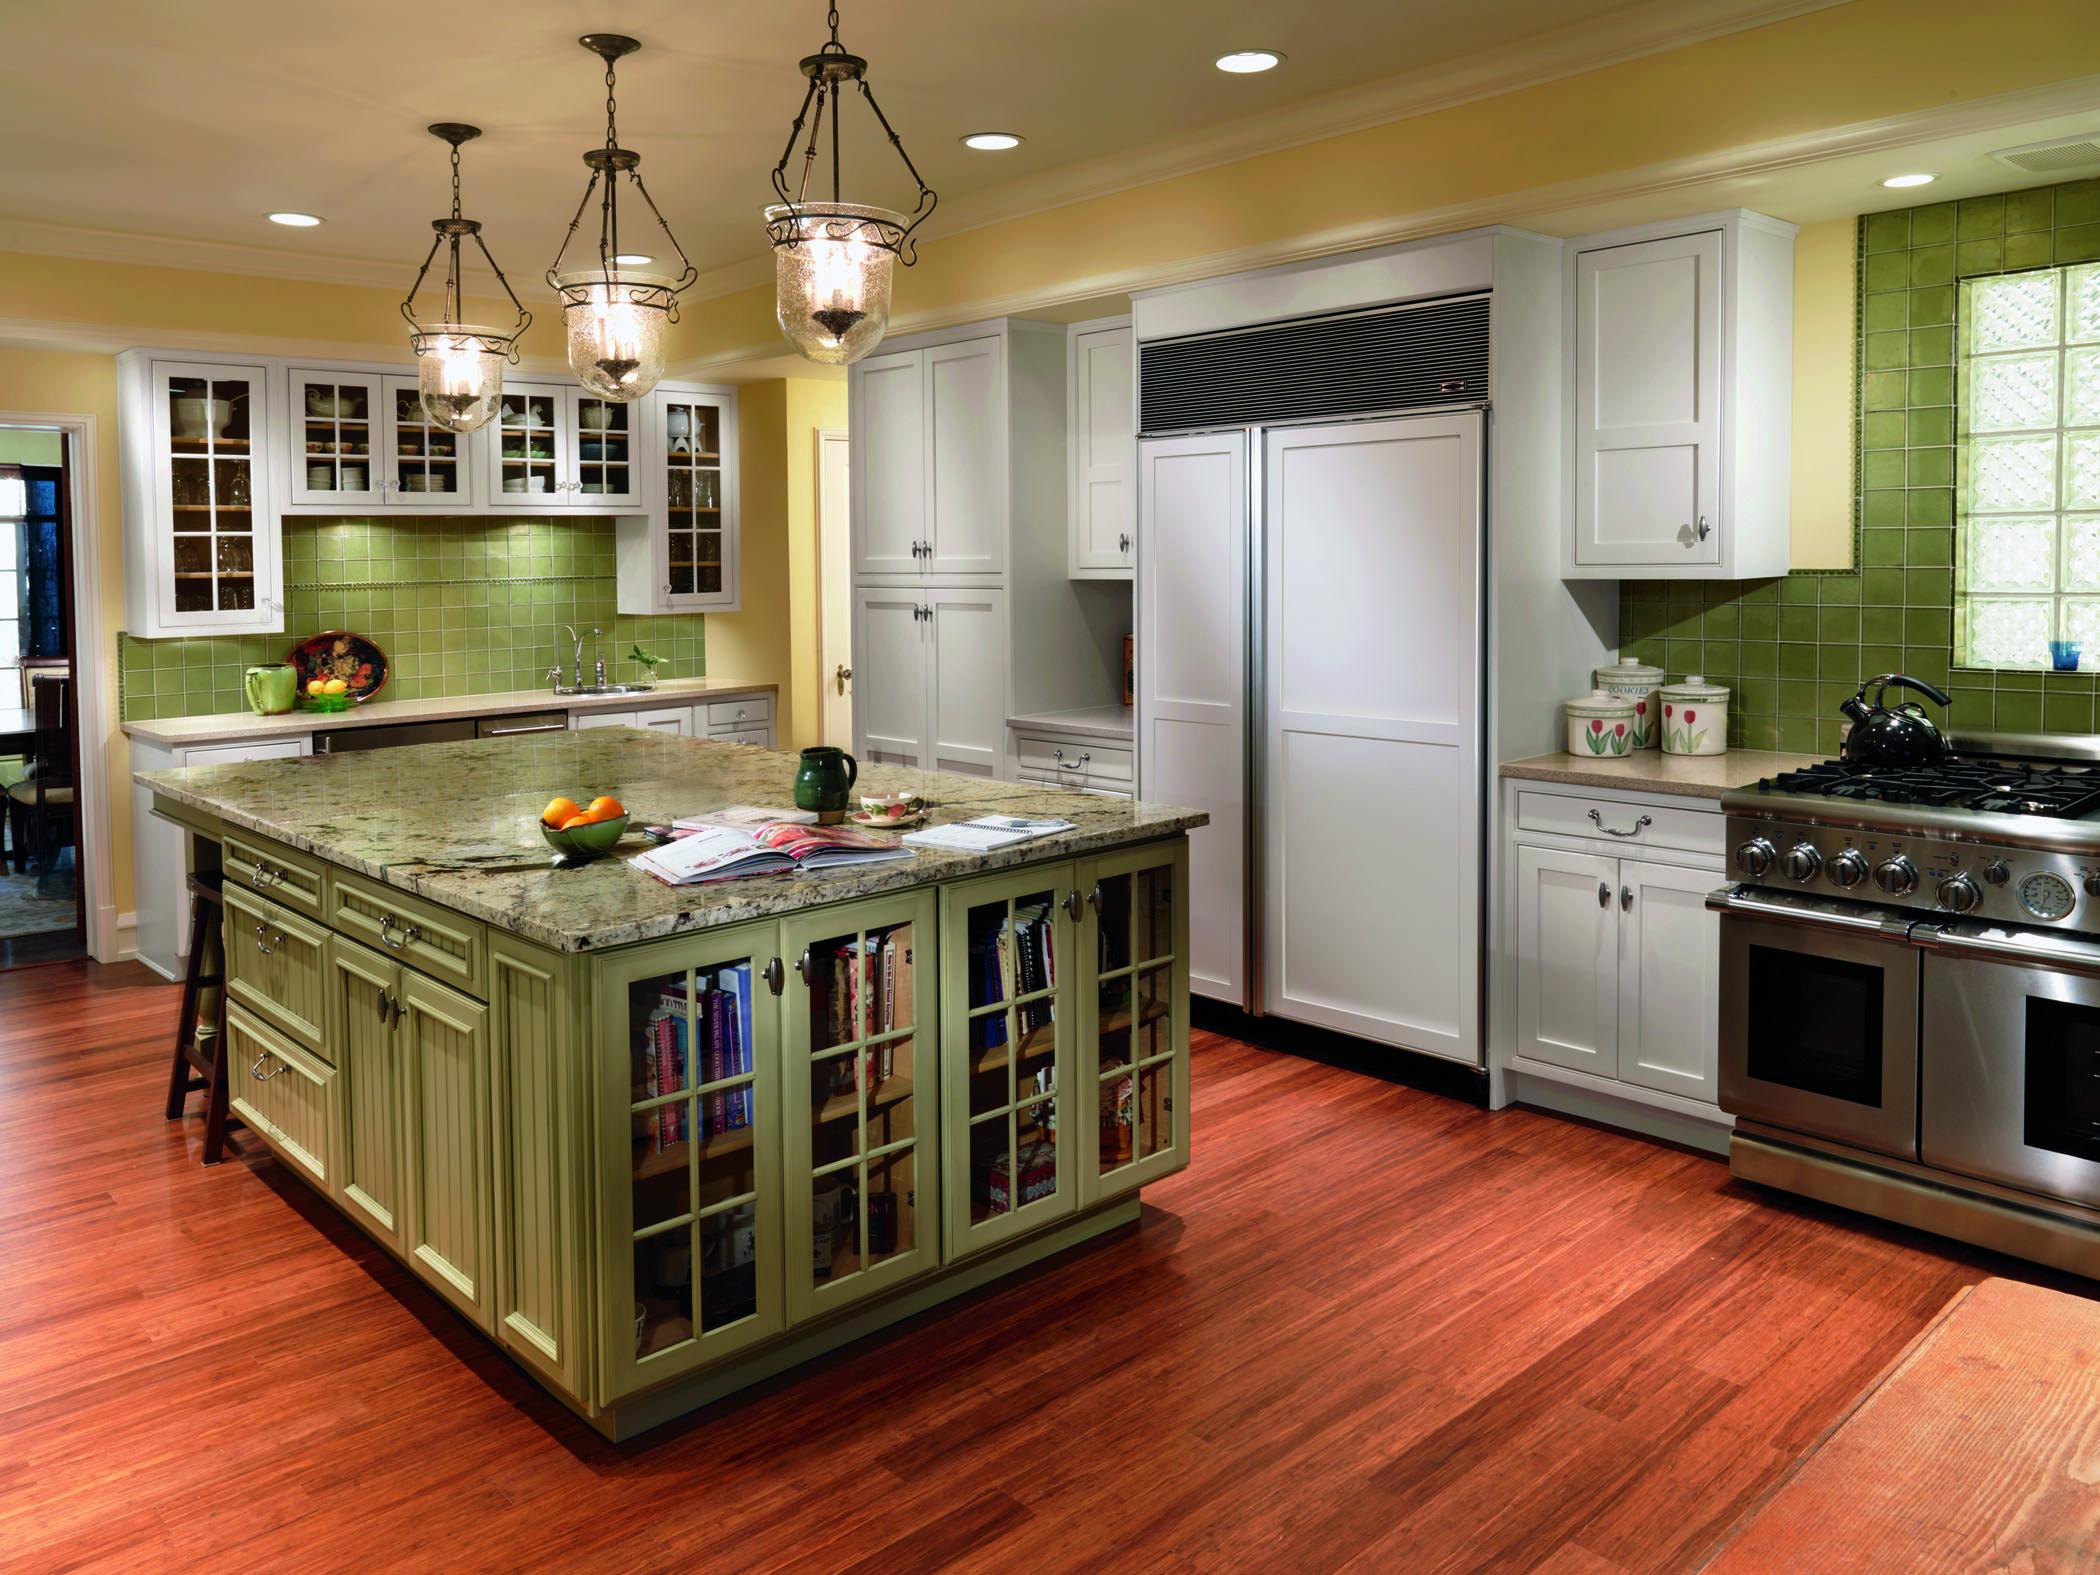 Best Kitchen Gallery: Haas Cabi Co Richmond V Door Style Inset Wood Species Maple of Haas Kitchen Cabinets Direct on rachelxblog.com